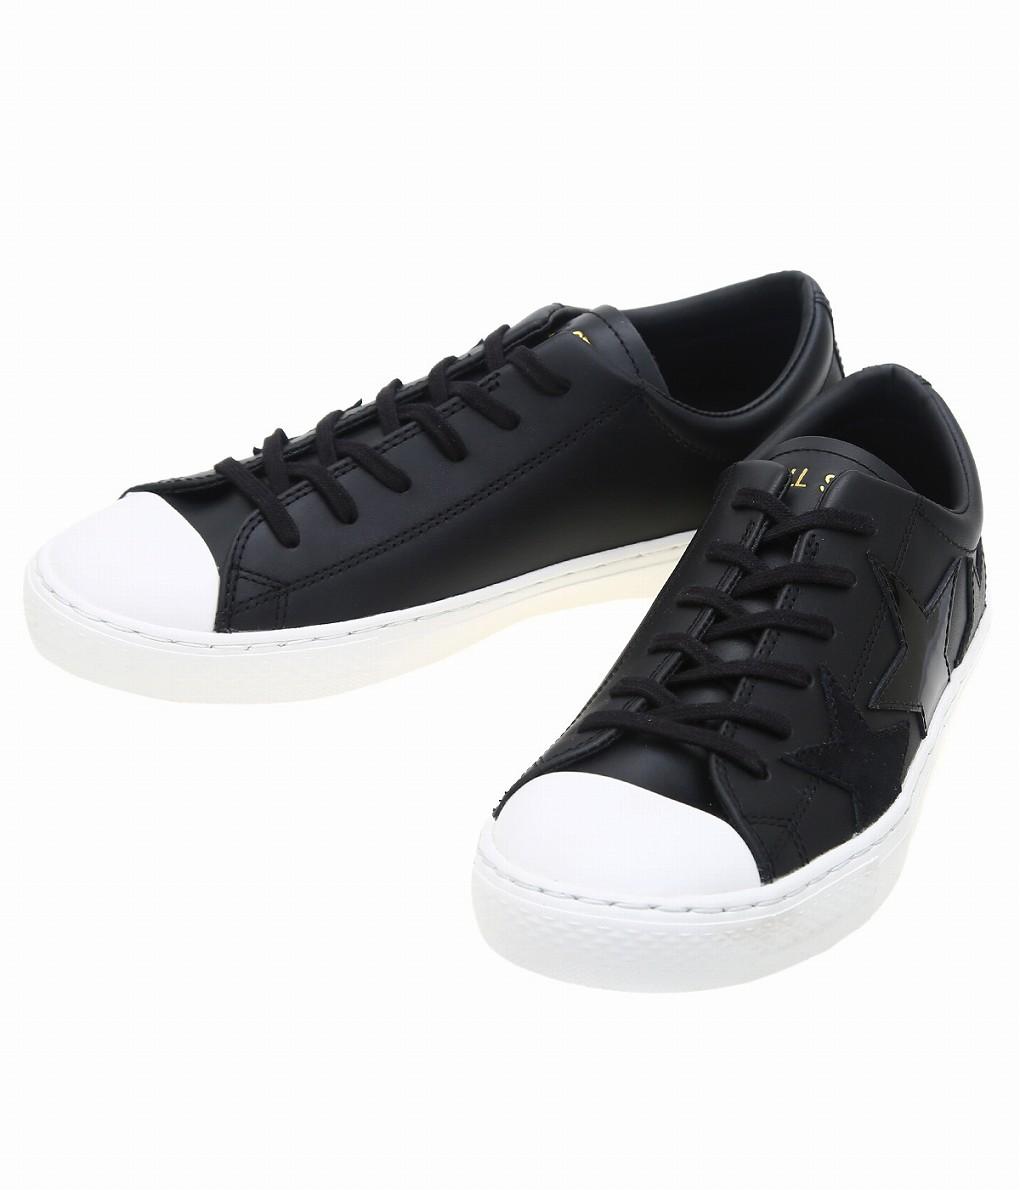 CONVERSE / コンバース : COUPE TRIOSTAR OX : コンバース オールスター シューズ 靴 スニーカー レディース : 31301731 【DEA】